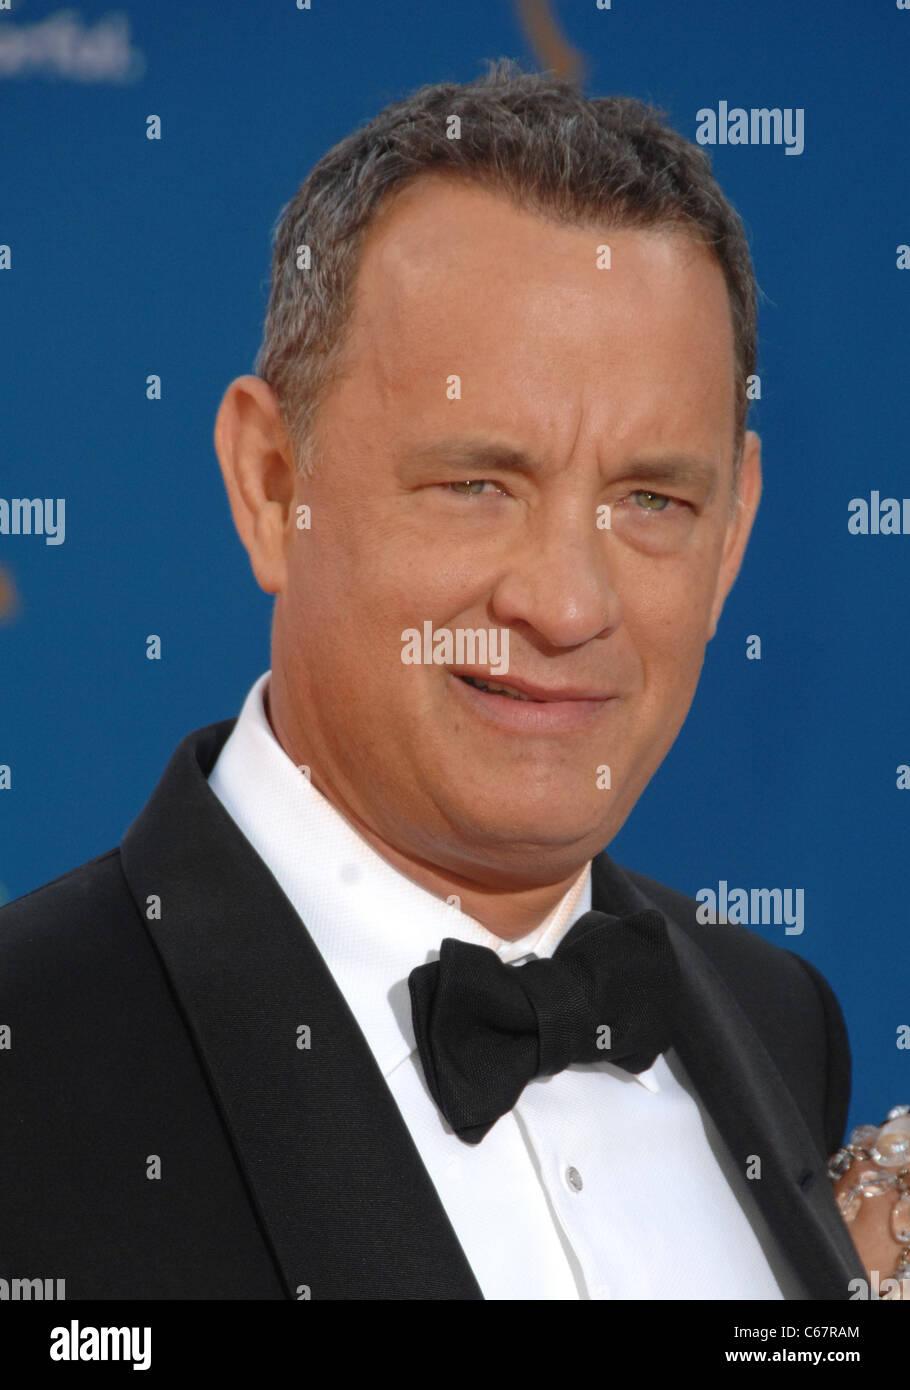 Tom Hanks at arrivals for Academy of Television Arts & Sciences 62nd Primetime Emmy Awards - ARRIVALS, Nokia - Stock Image